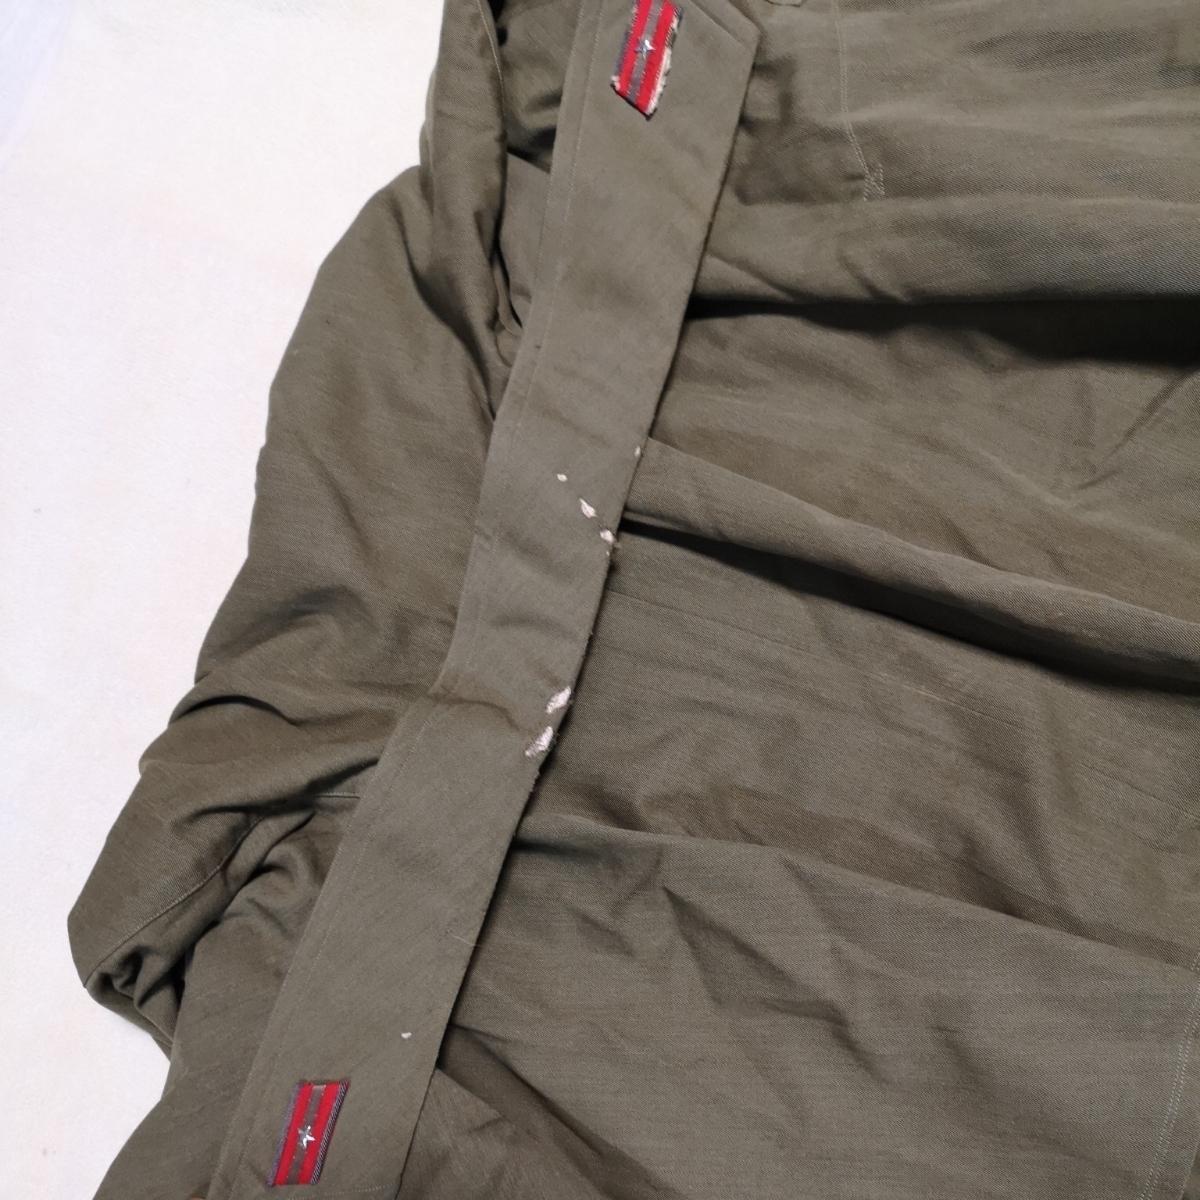 日本軍 将校マント 少尉 外套 襟章付き 戦前 洋品店仕立 軍服_画像8